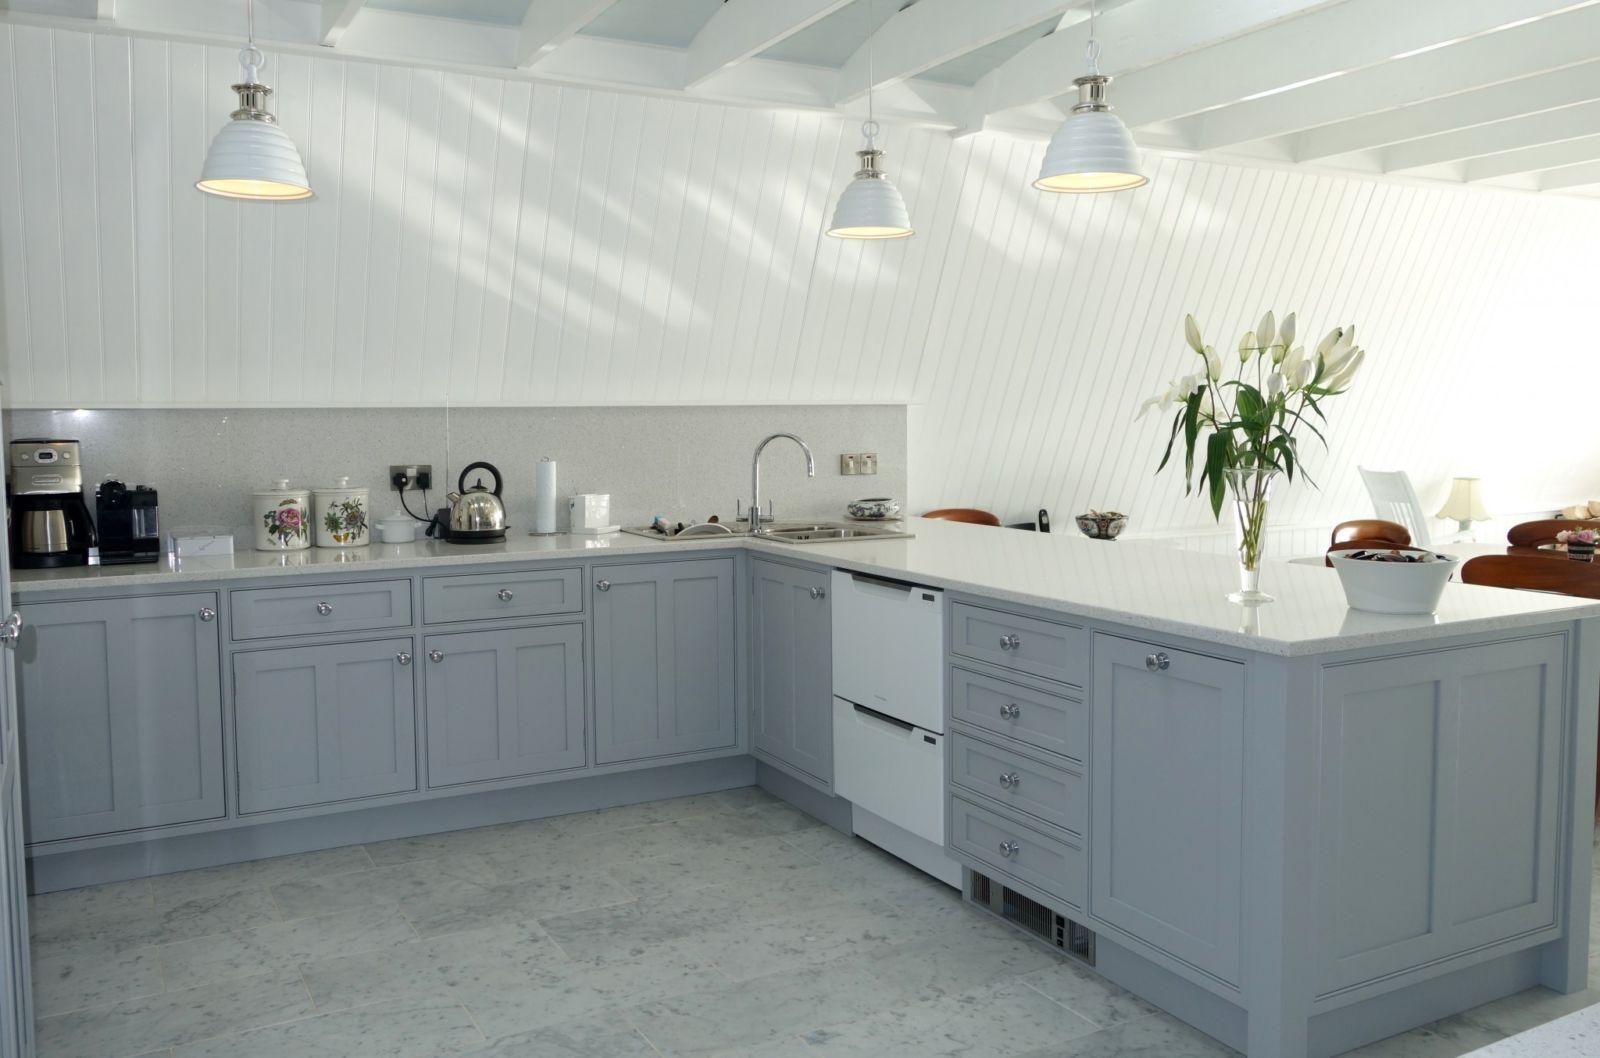 Bespoke Kitchen Isle of Arran Scotland - Bespoke